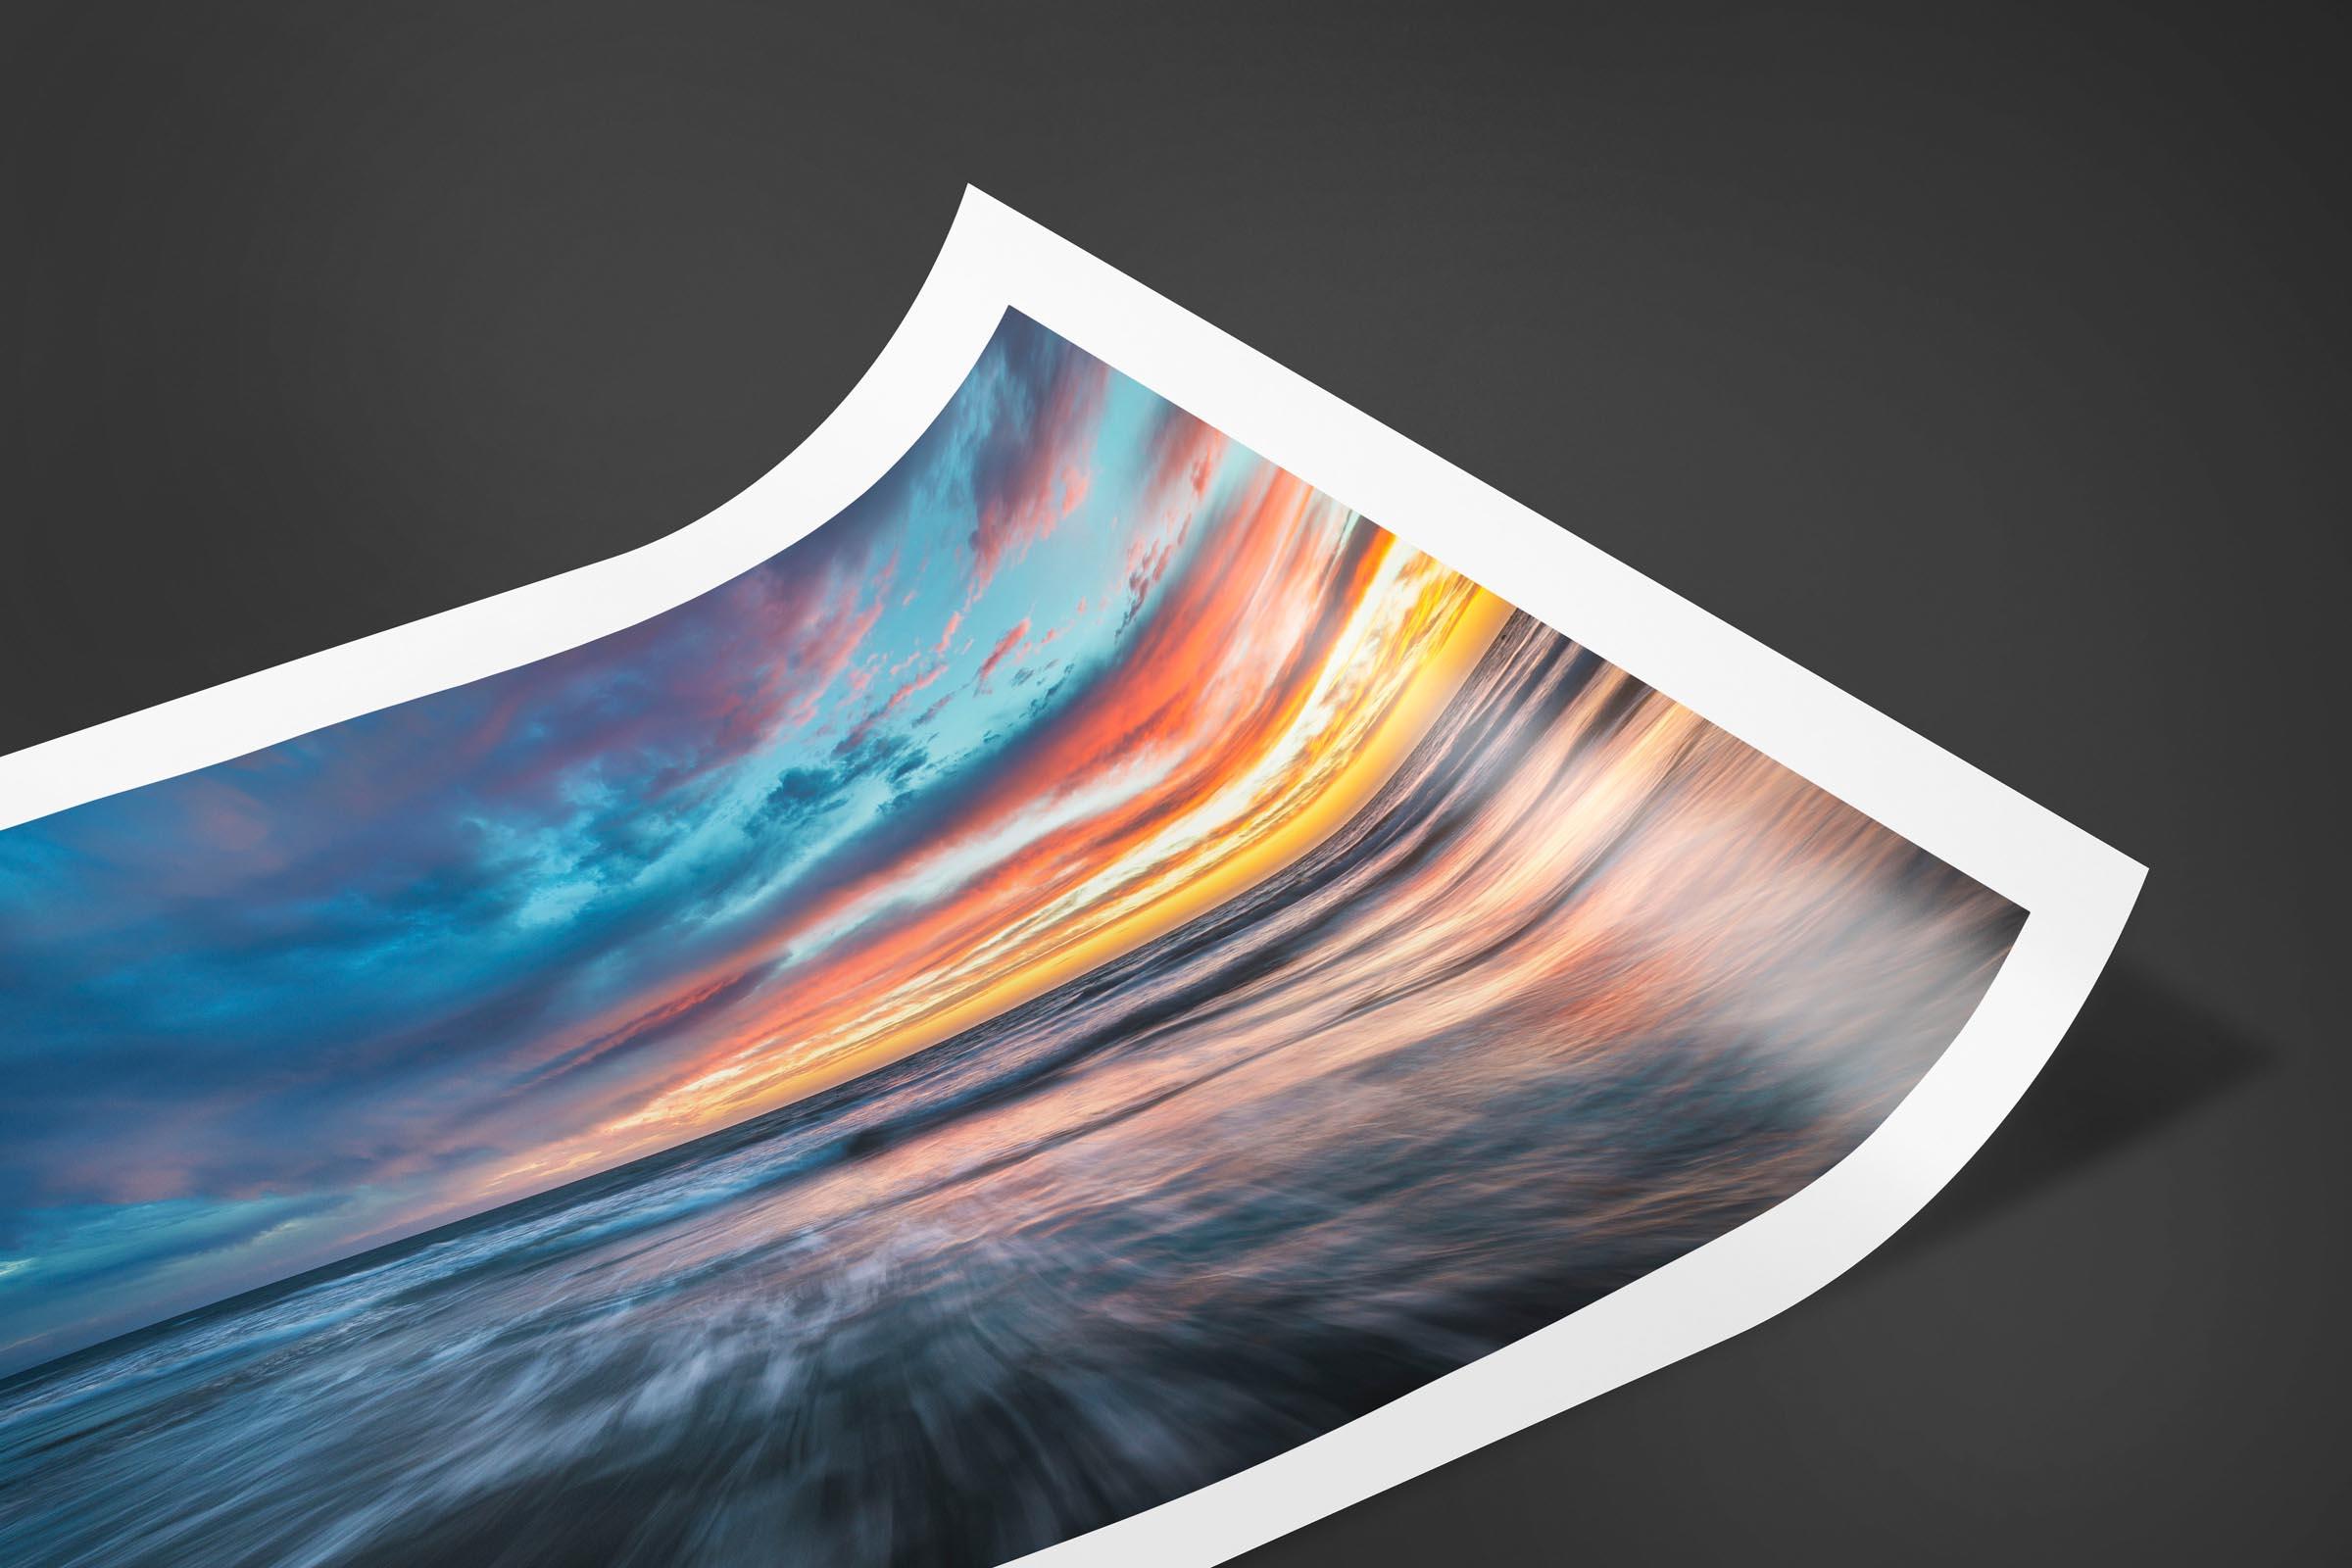 Fine art limited edition print of Santa Monica Sunset in Santa Monica, California by Brent Goldman Photography